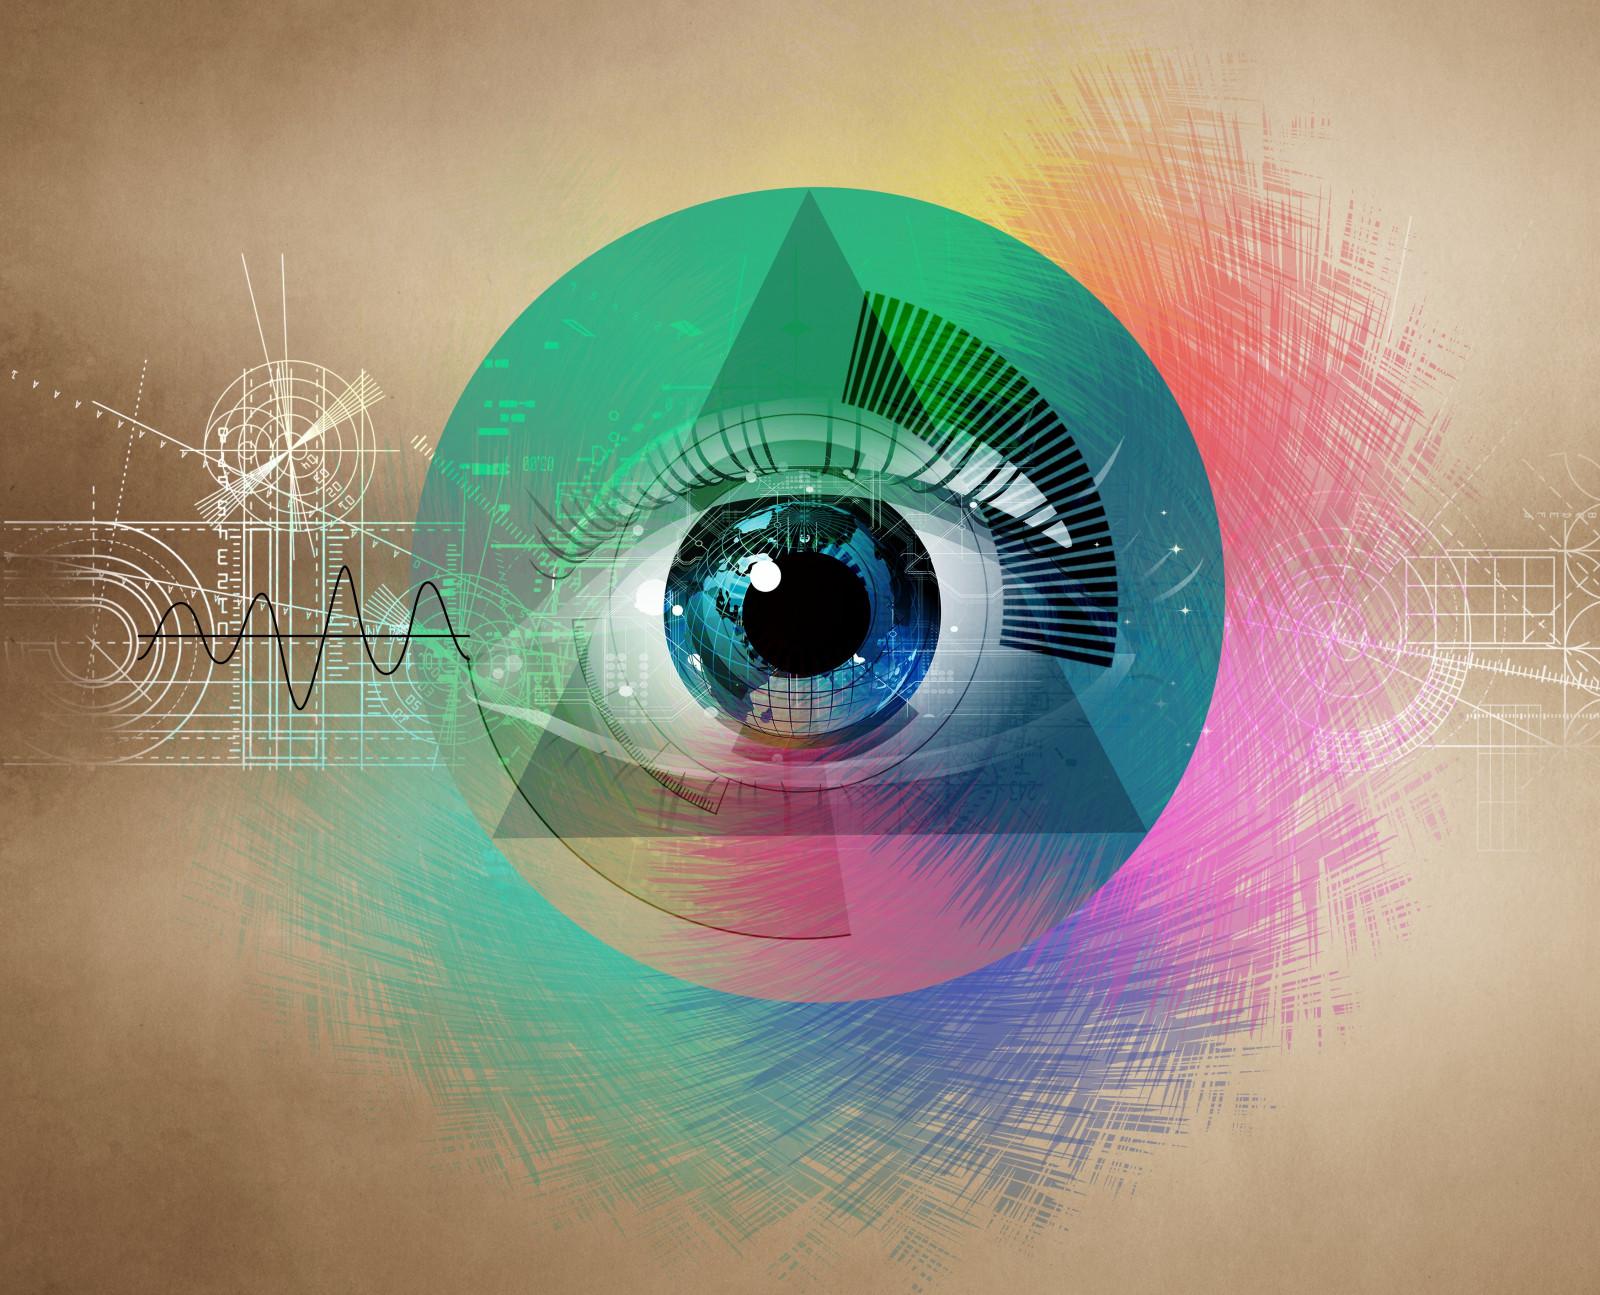 Wallpaper eye drawing abstract geometric shapes forms 4500x3644 wallup 1006206 hd - Eye drawing wallpaper ...